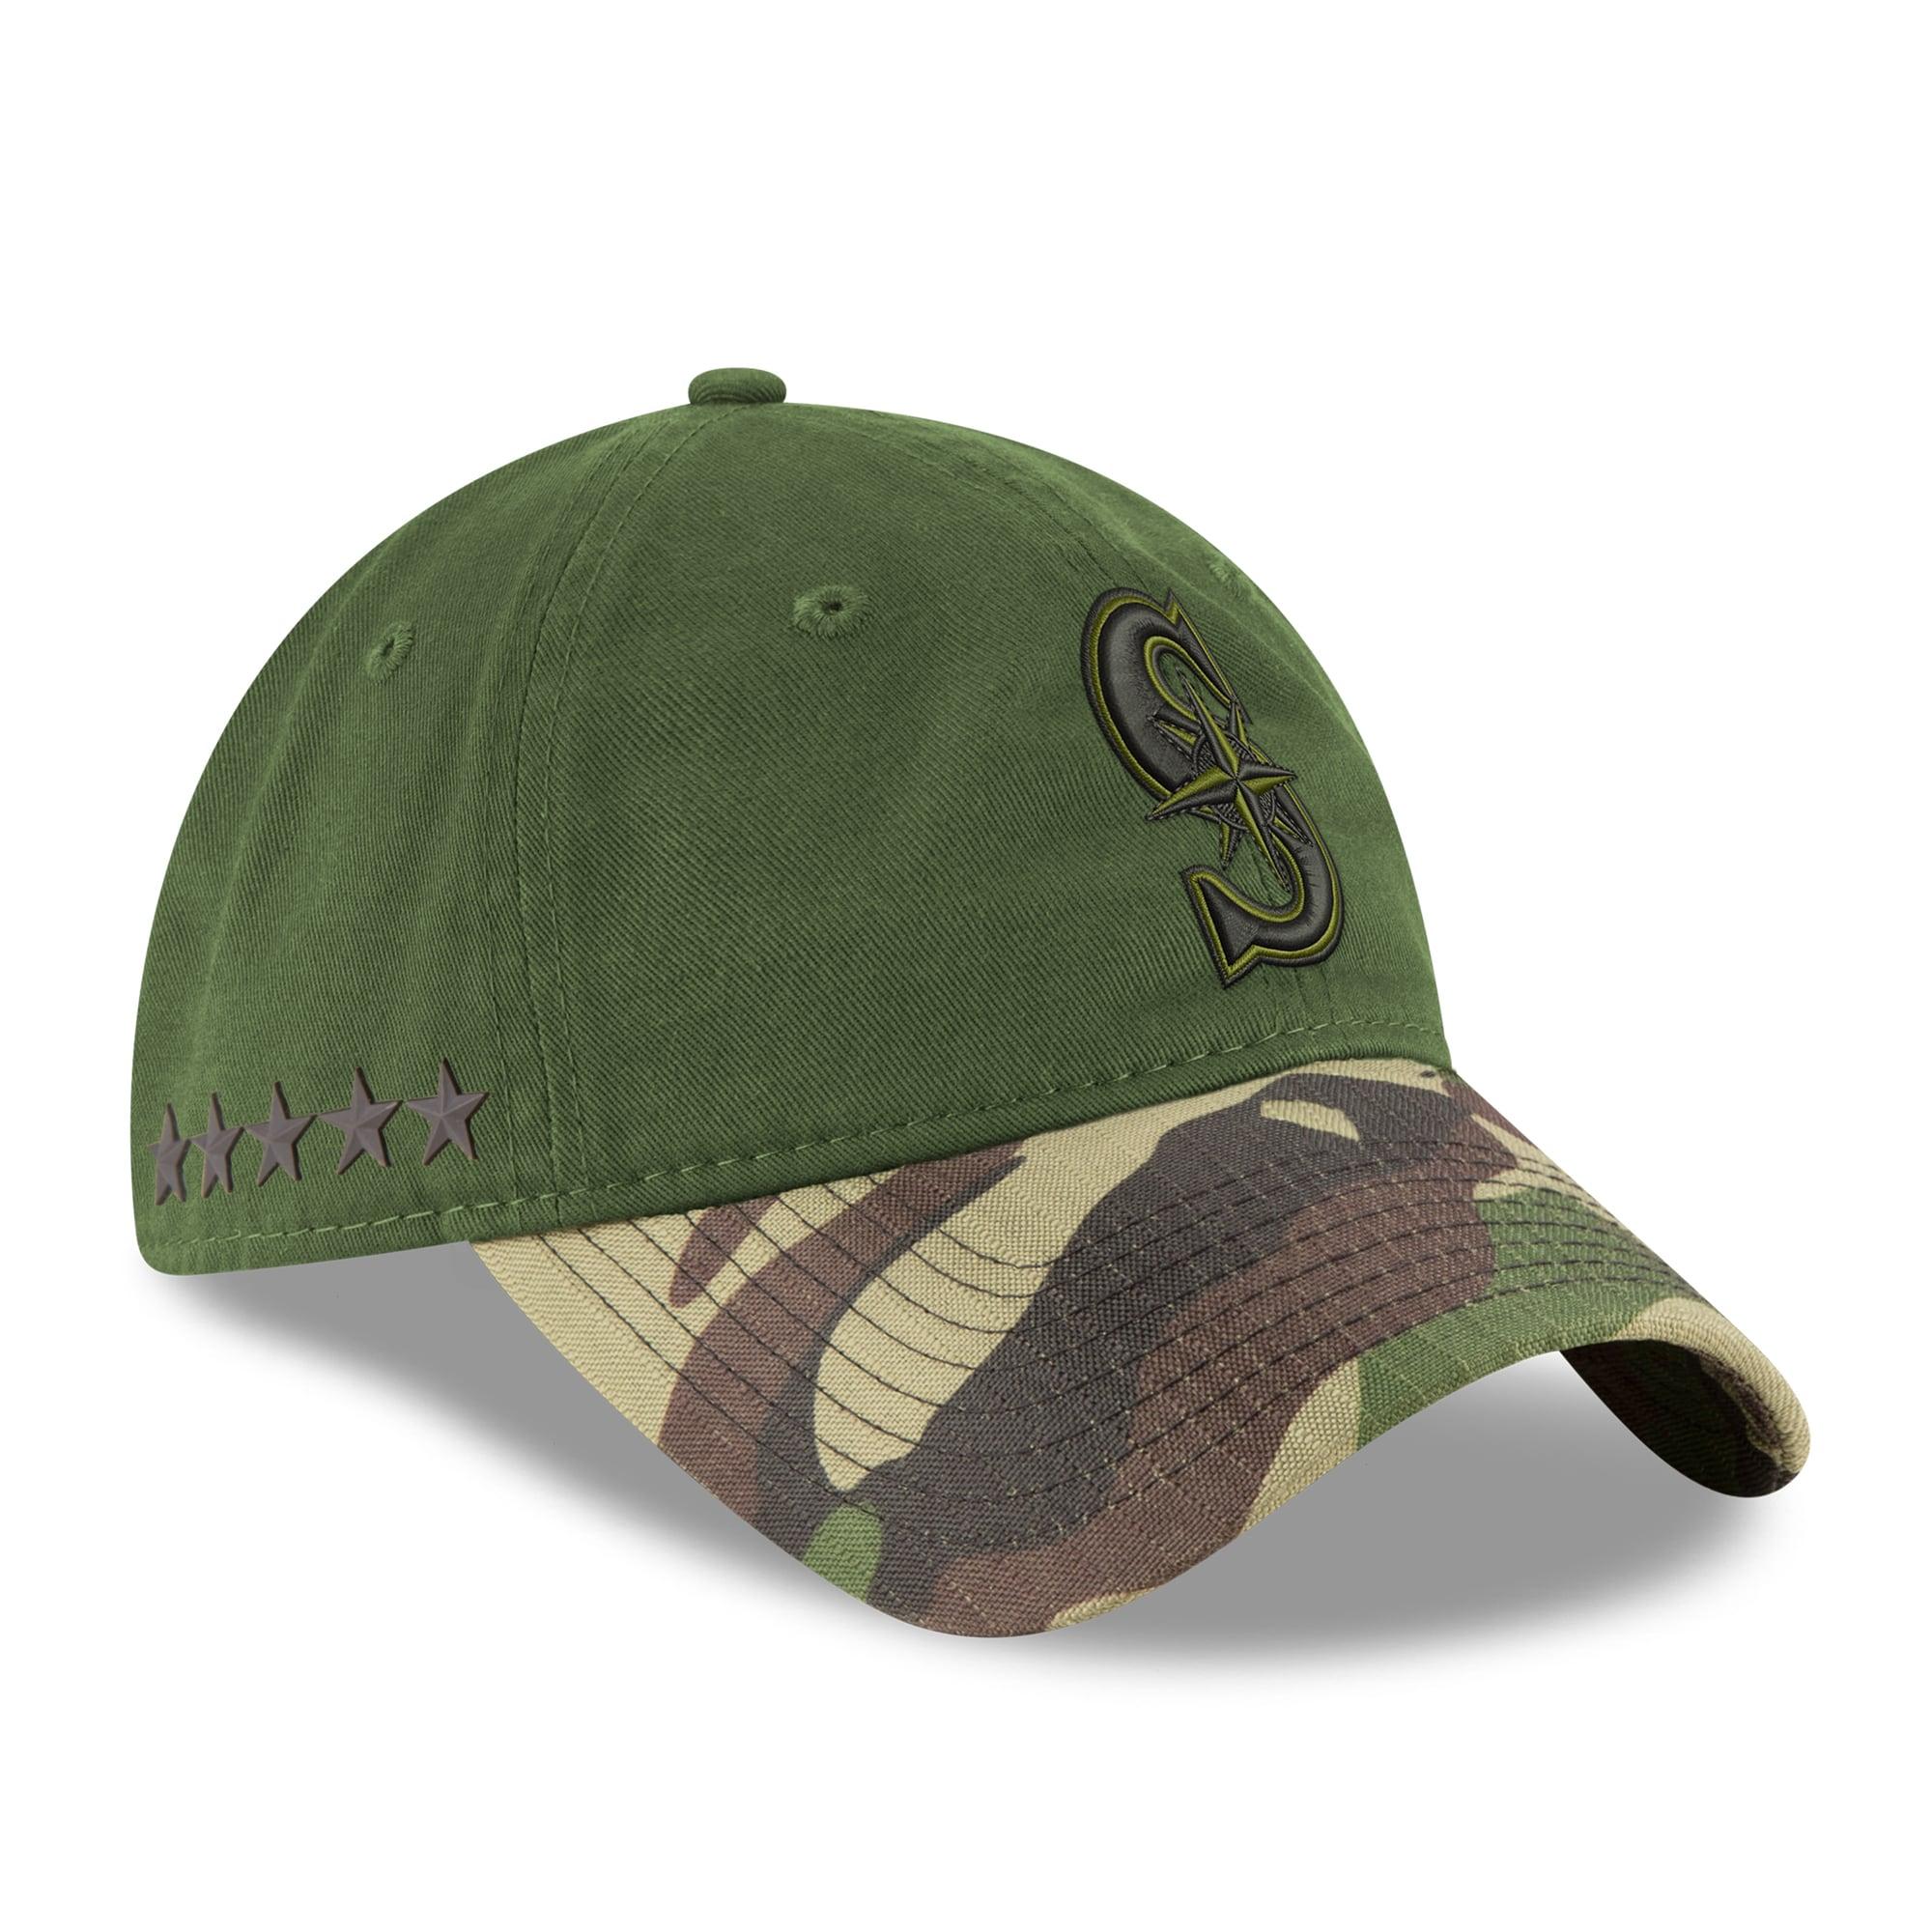 Seattle Mariners New Era 2017 Memorial Day 9TWENTY Adjustable Hat - Green/Camo